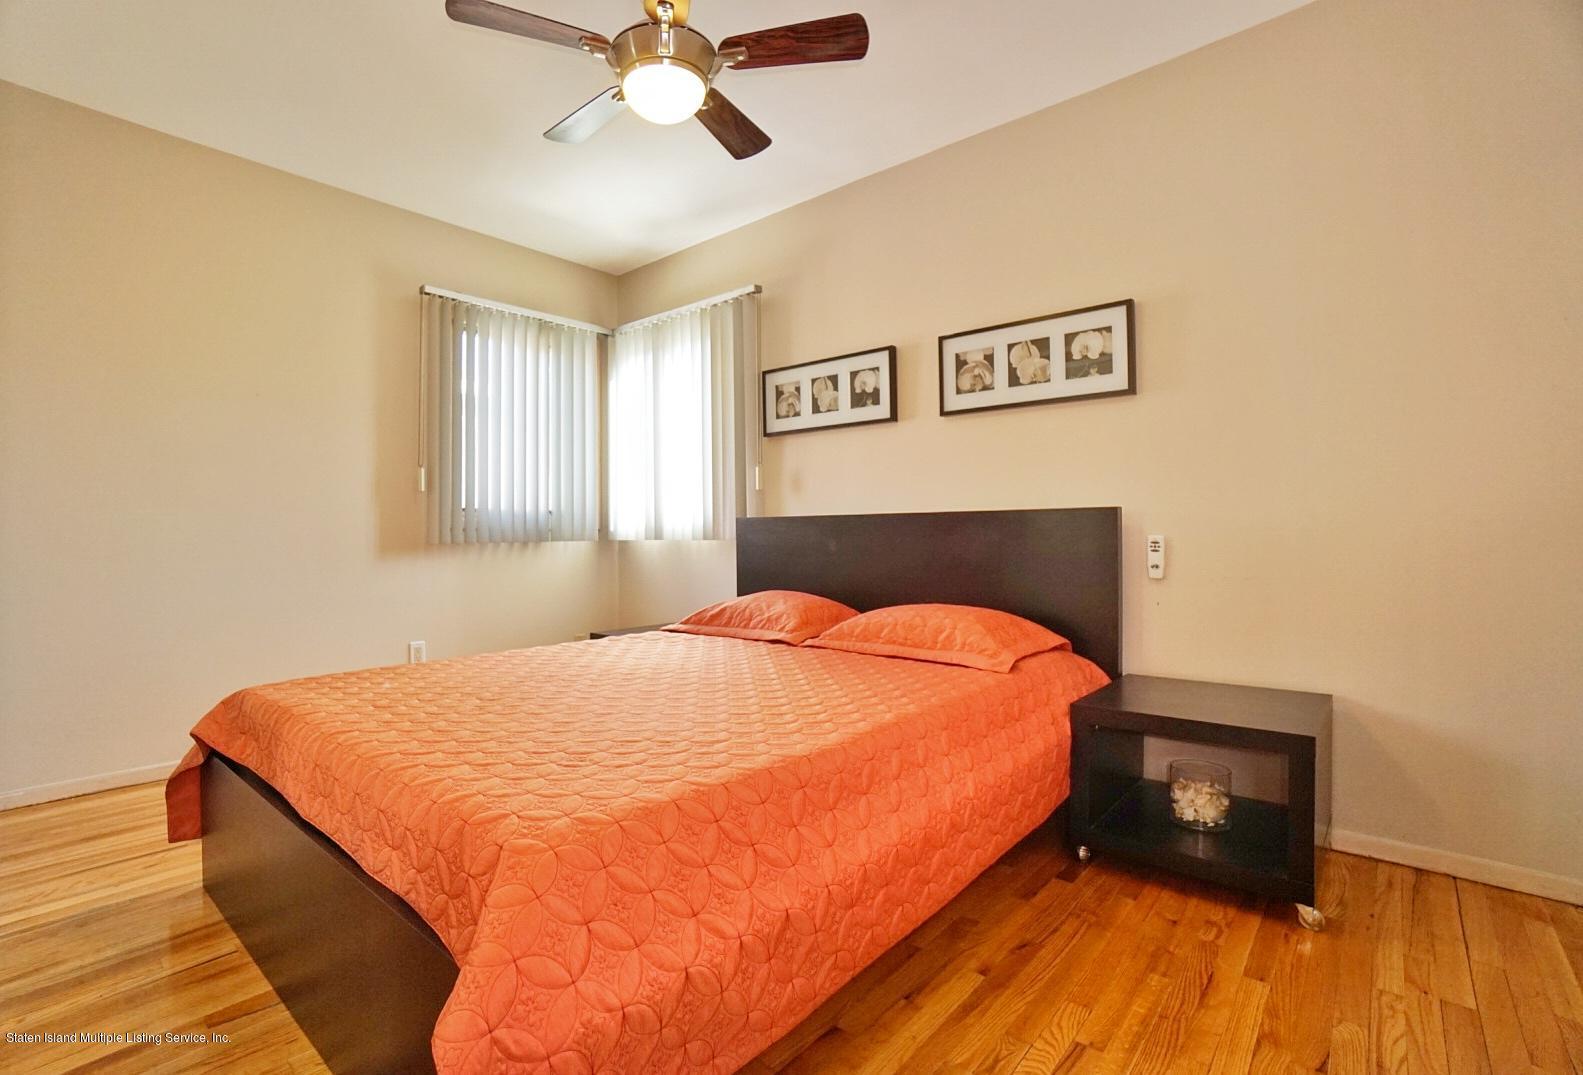 Single Family - Detached 183 Kensington Avenue  Staten Island, NY 10305, MLS-1127107-28